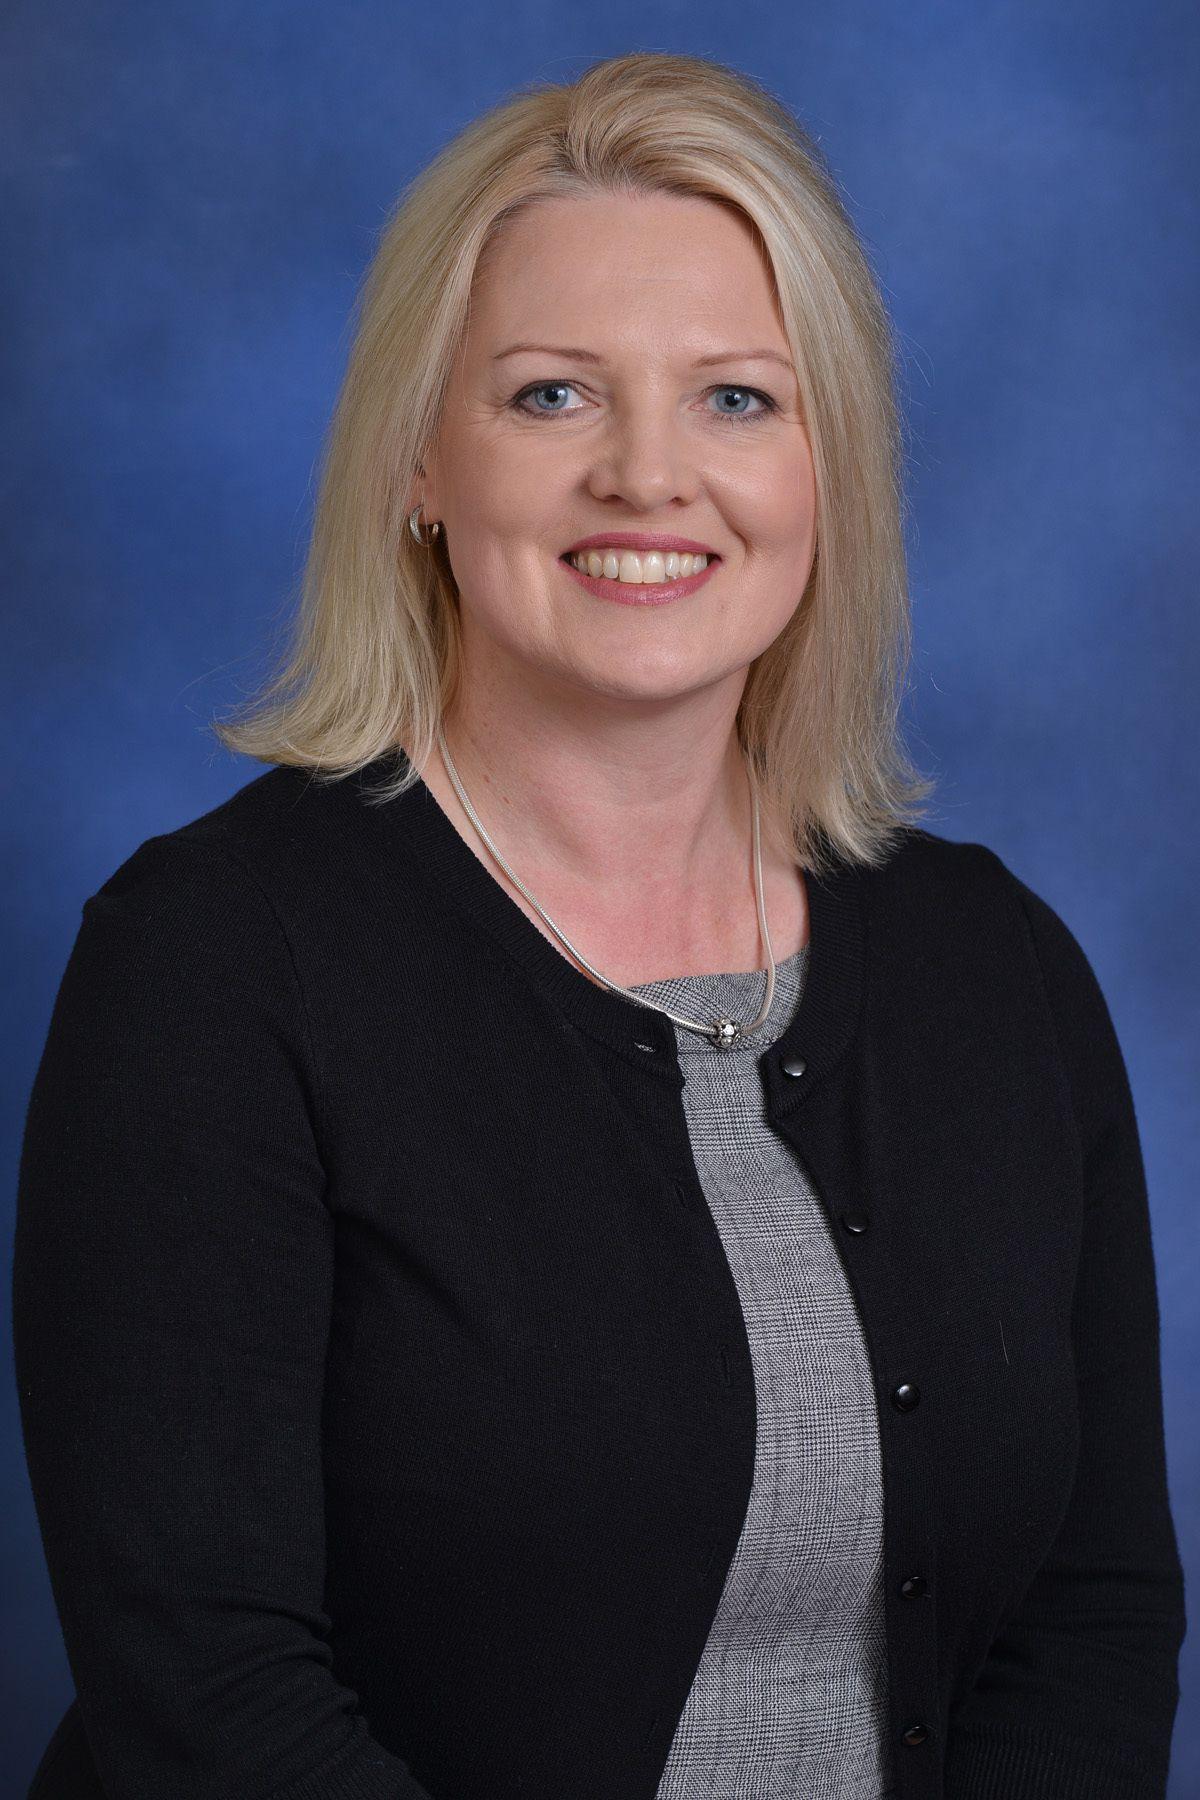 Nicole Gunter, of Nicole Gunter Wealth Management